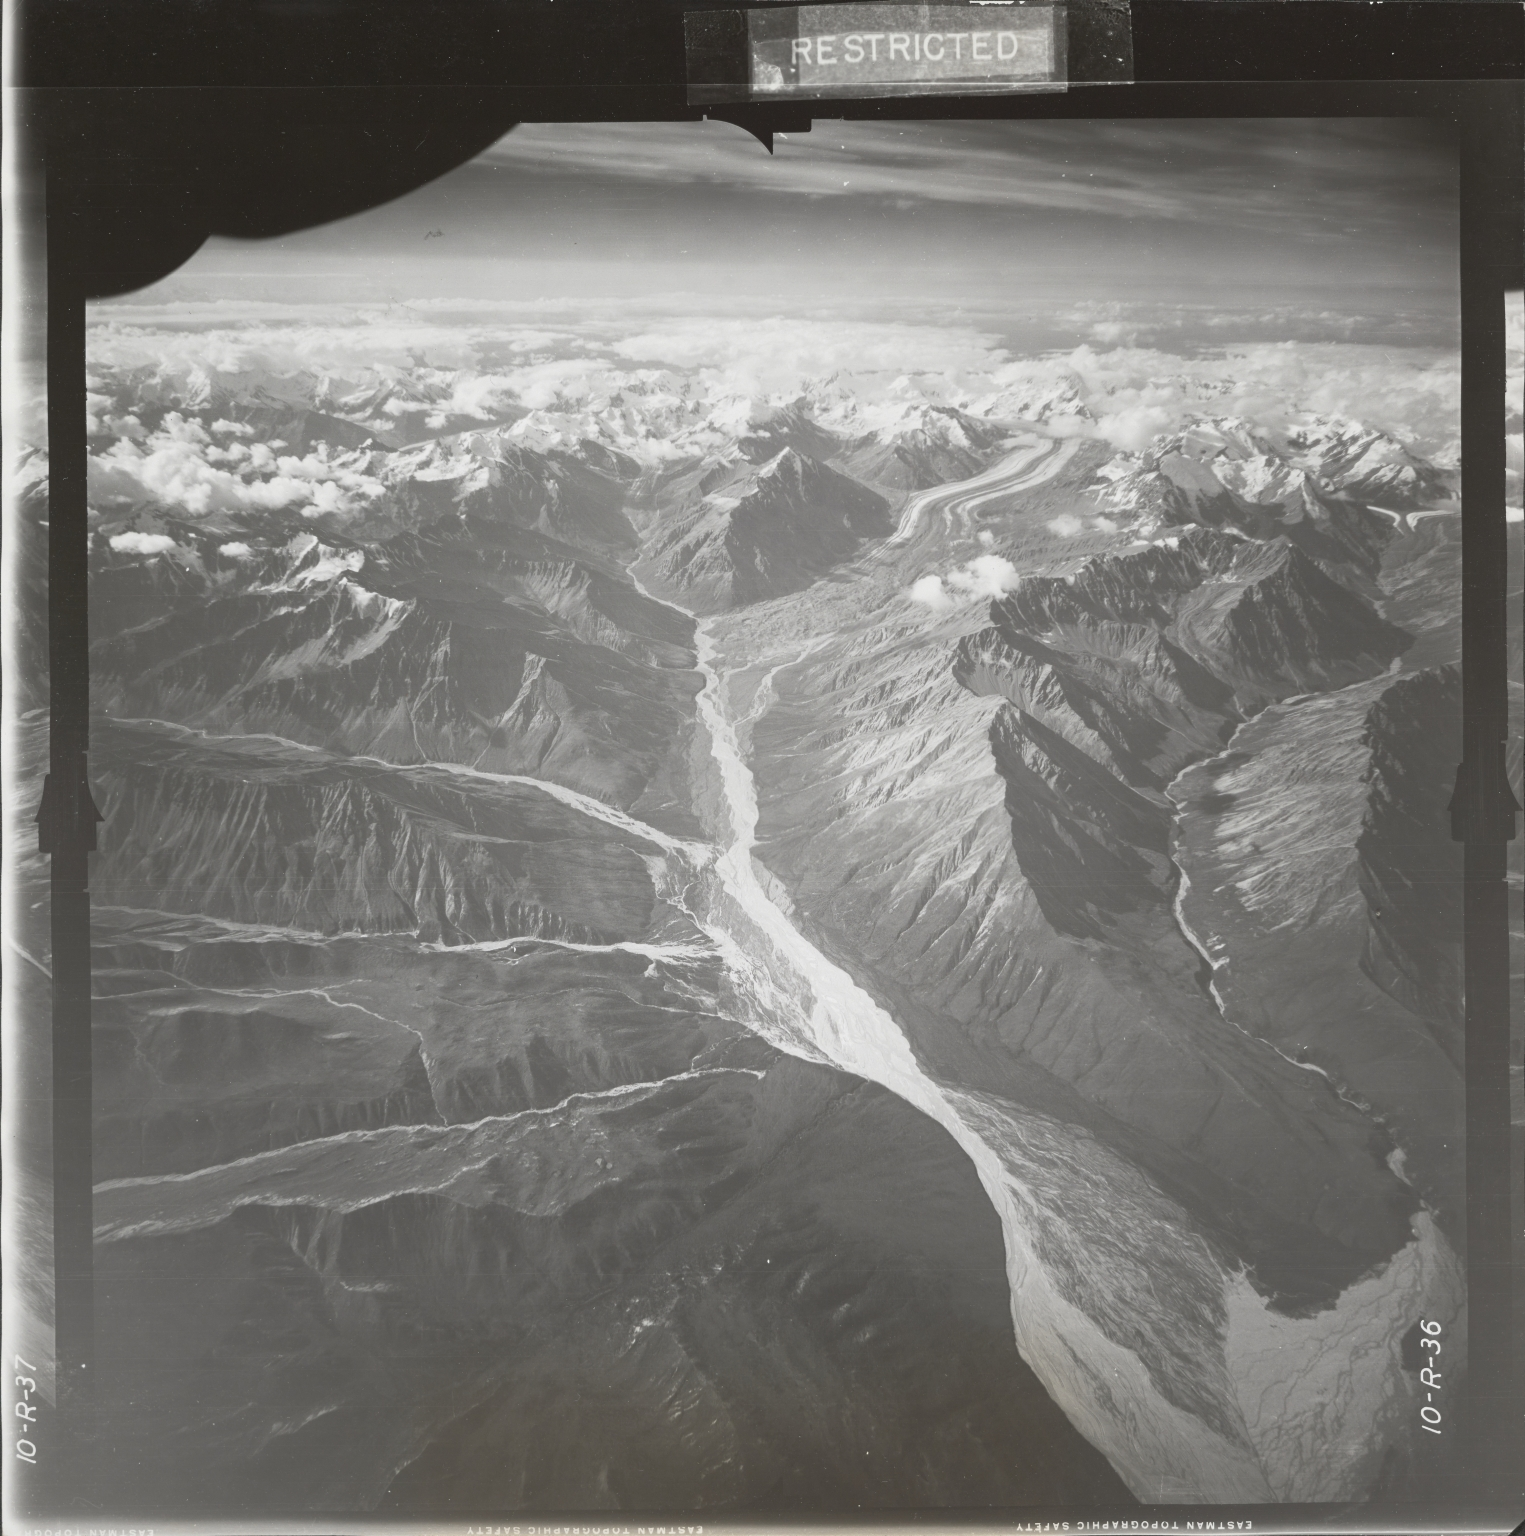 At head of Johnson River, aerial photograph FL 18 R-36, Alaska